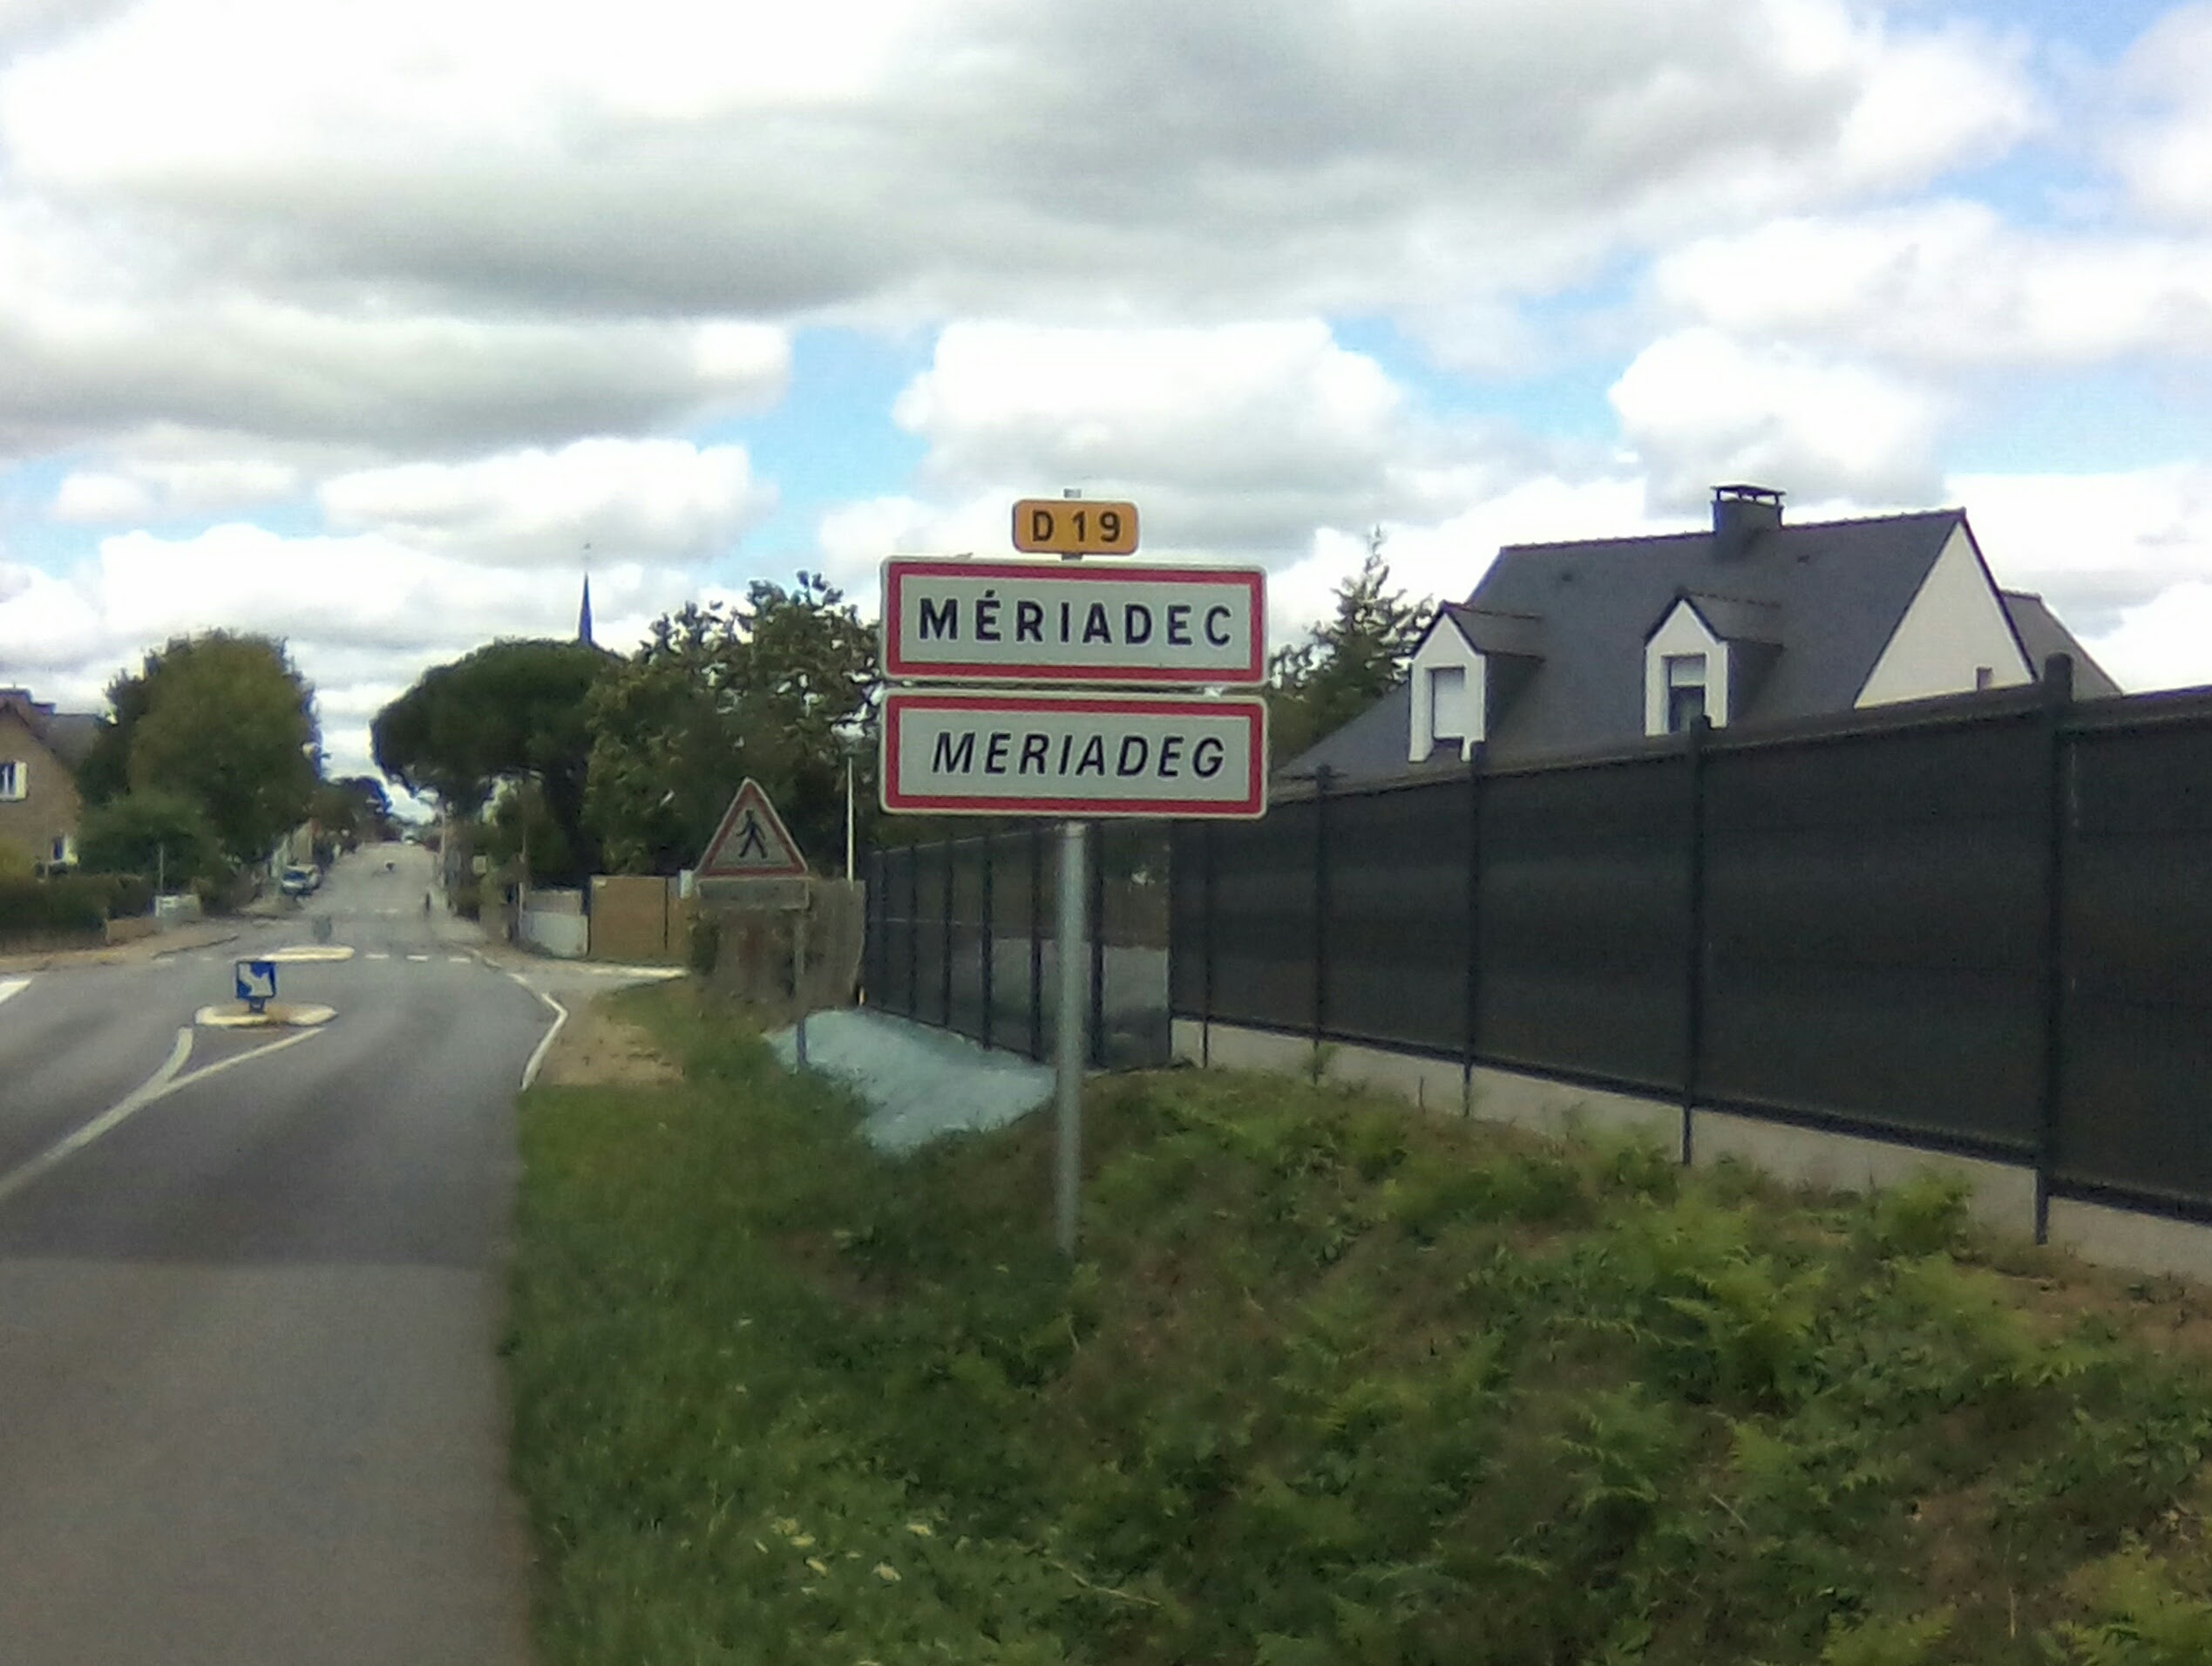 690 km autour de la Bretagne File